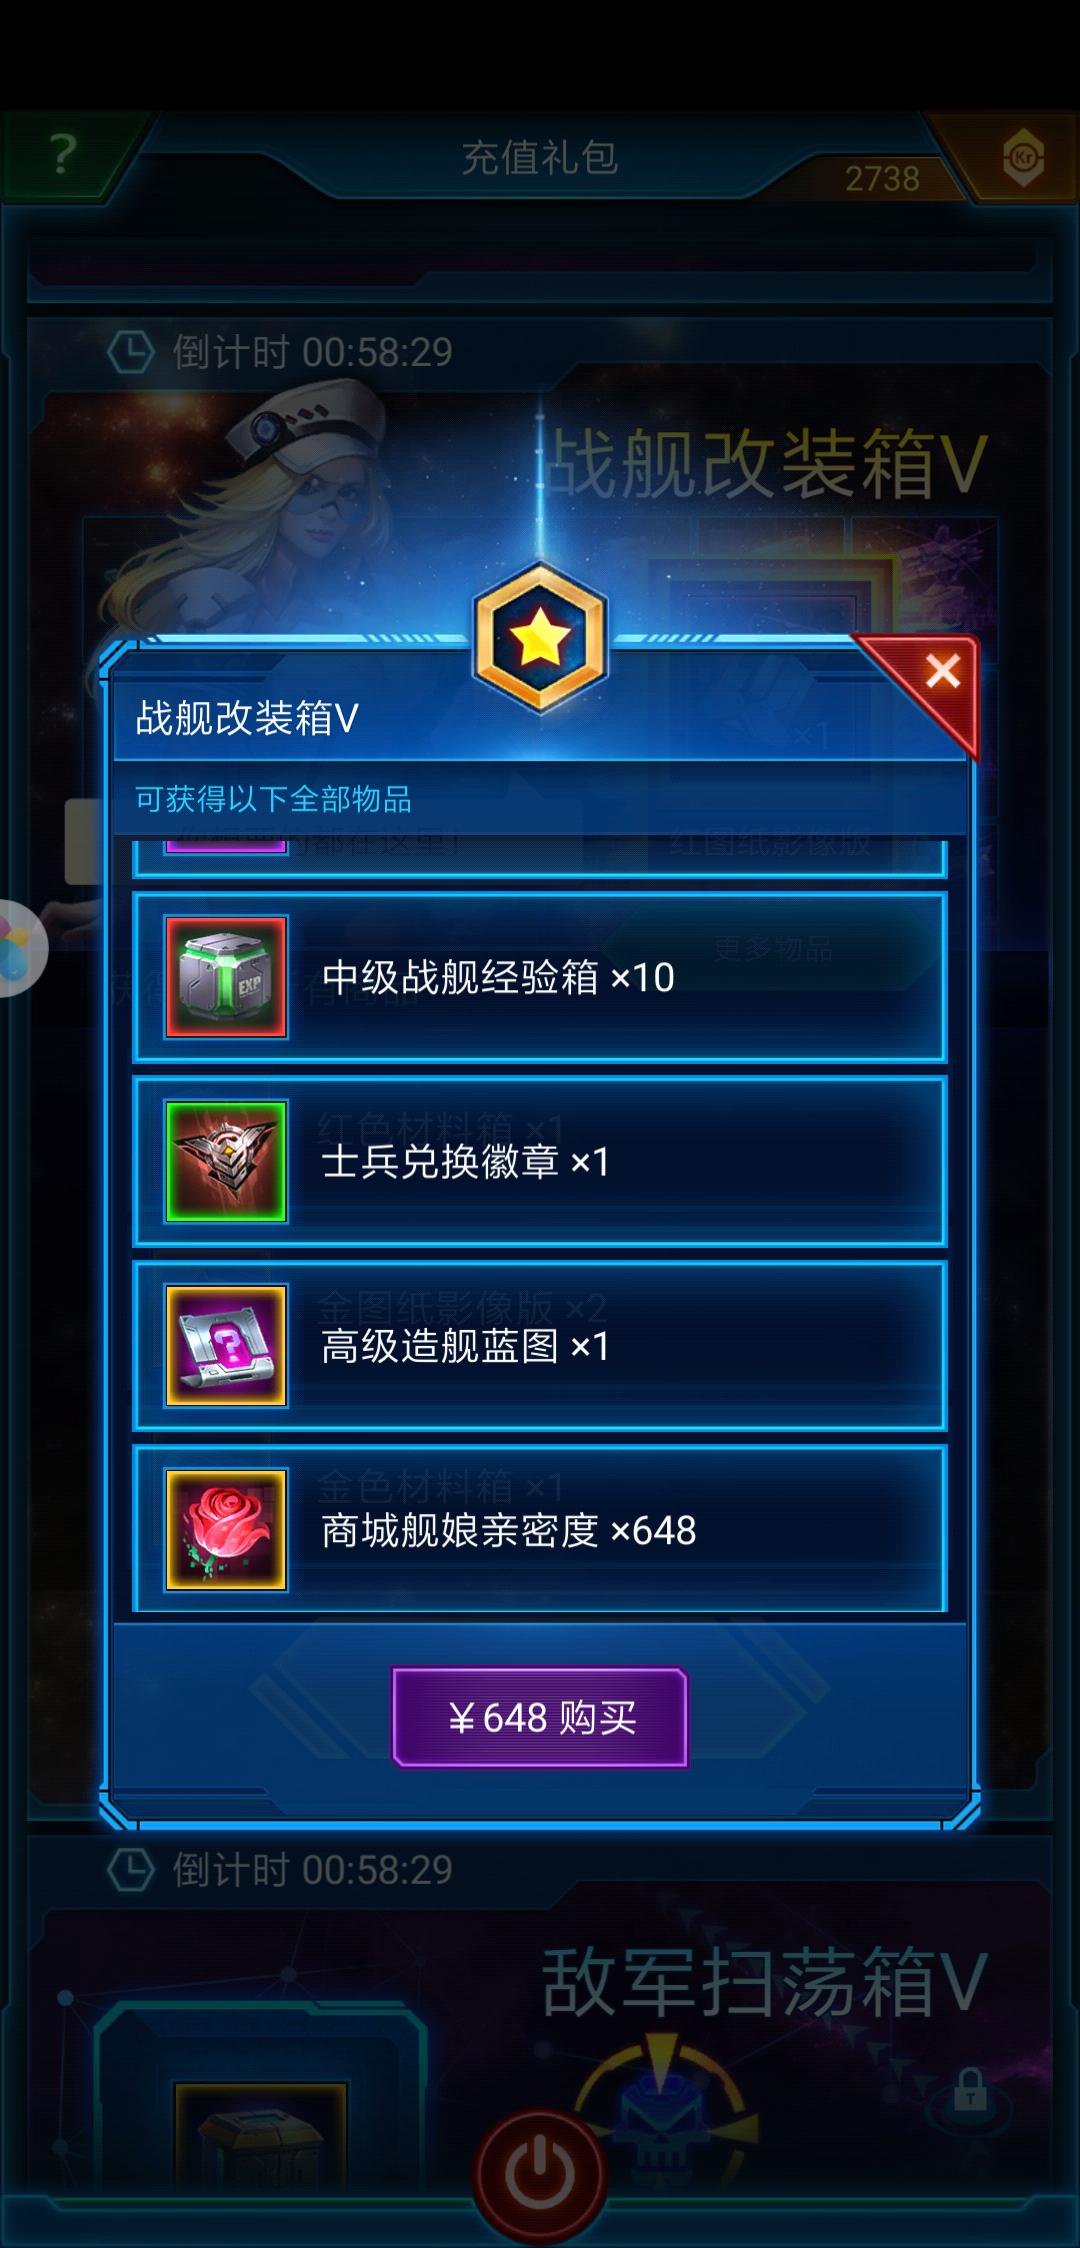 Screenshot_2018-11-18-11-02-26-965_com.jedigames.p16s.huawei.png